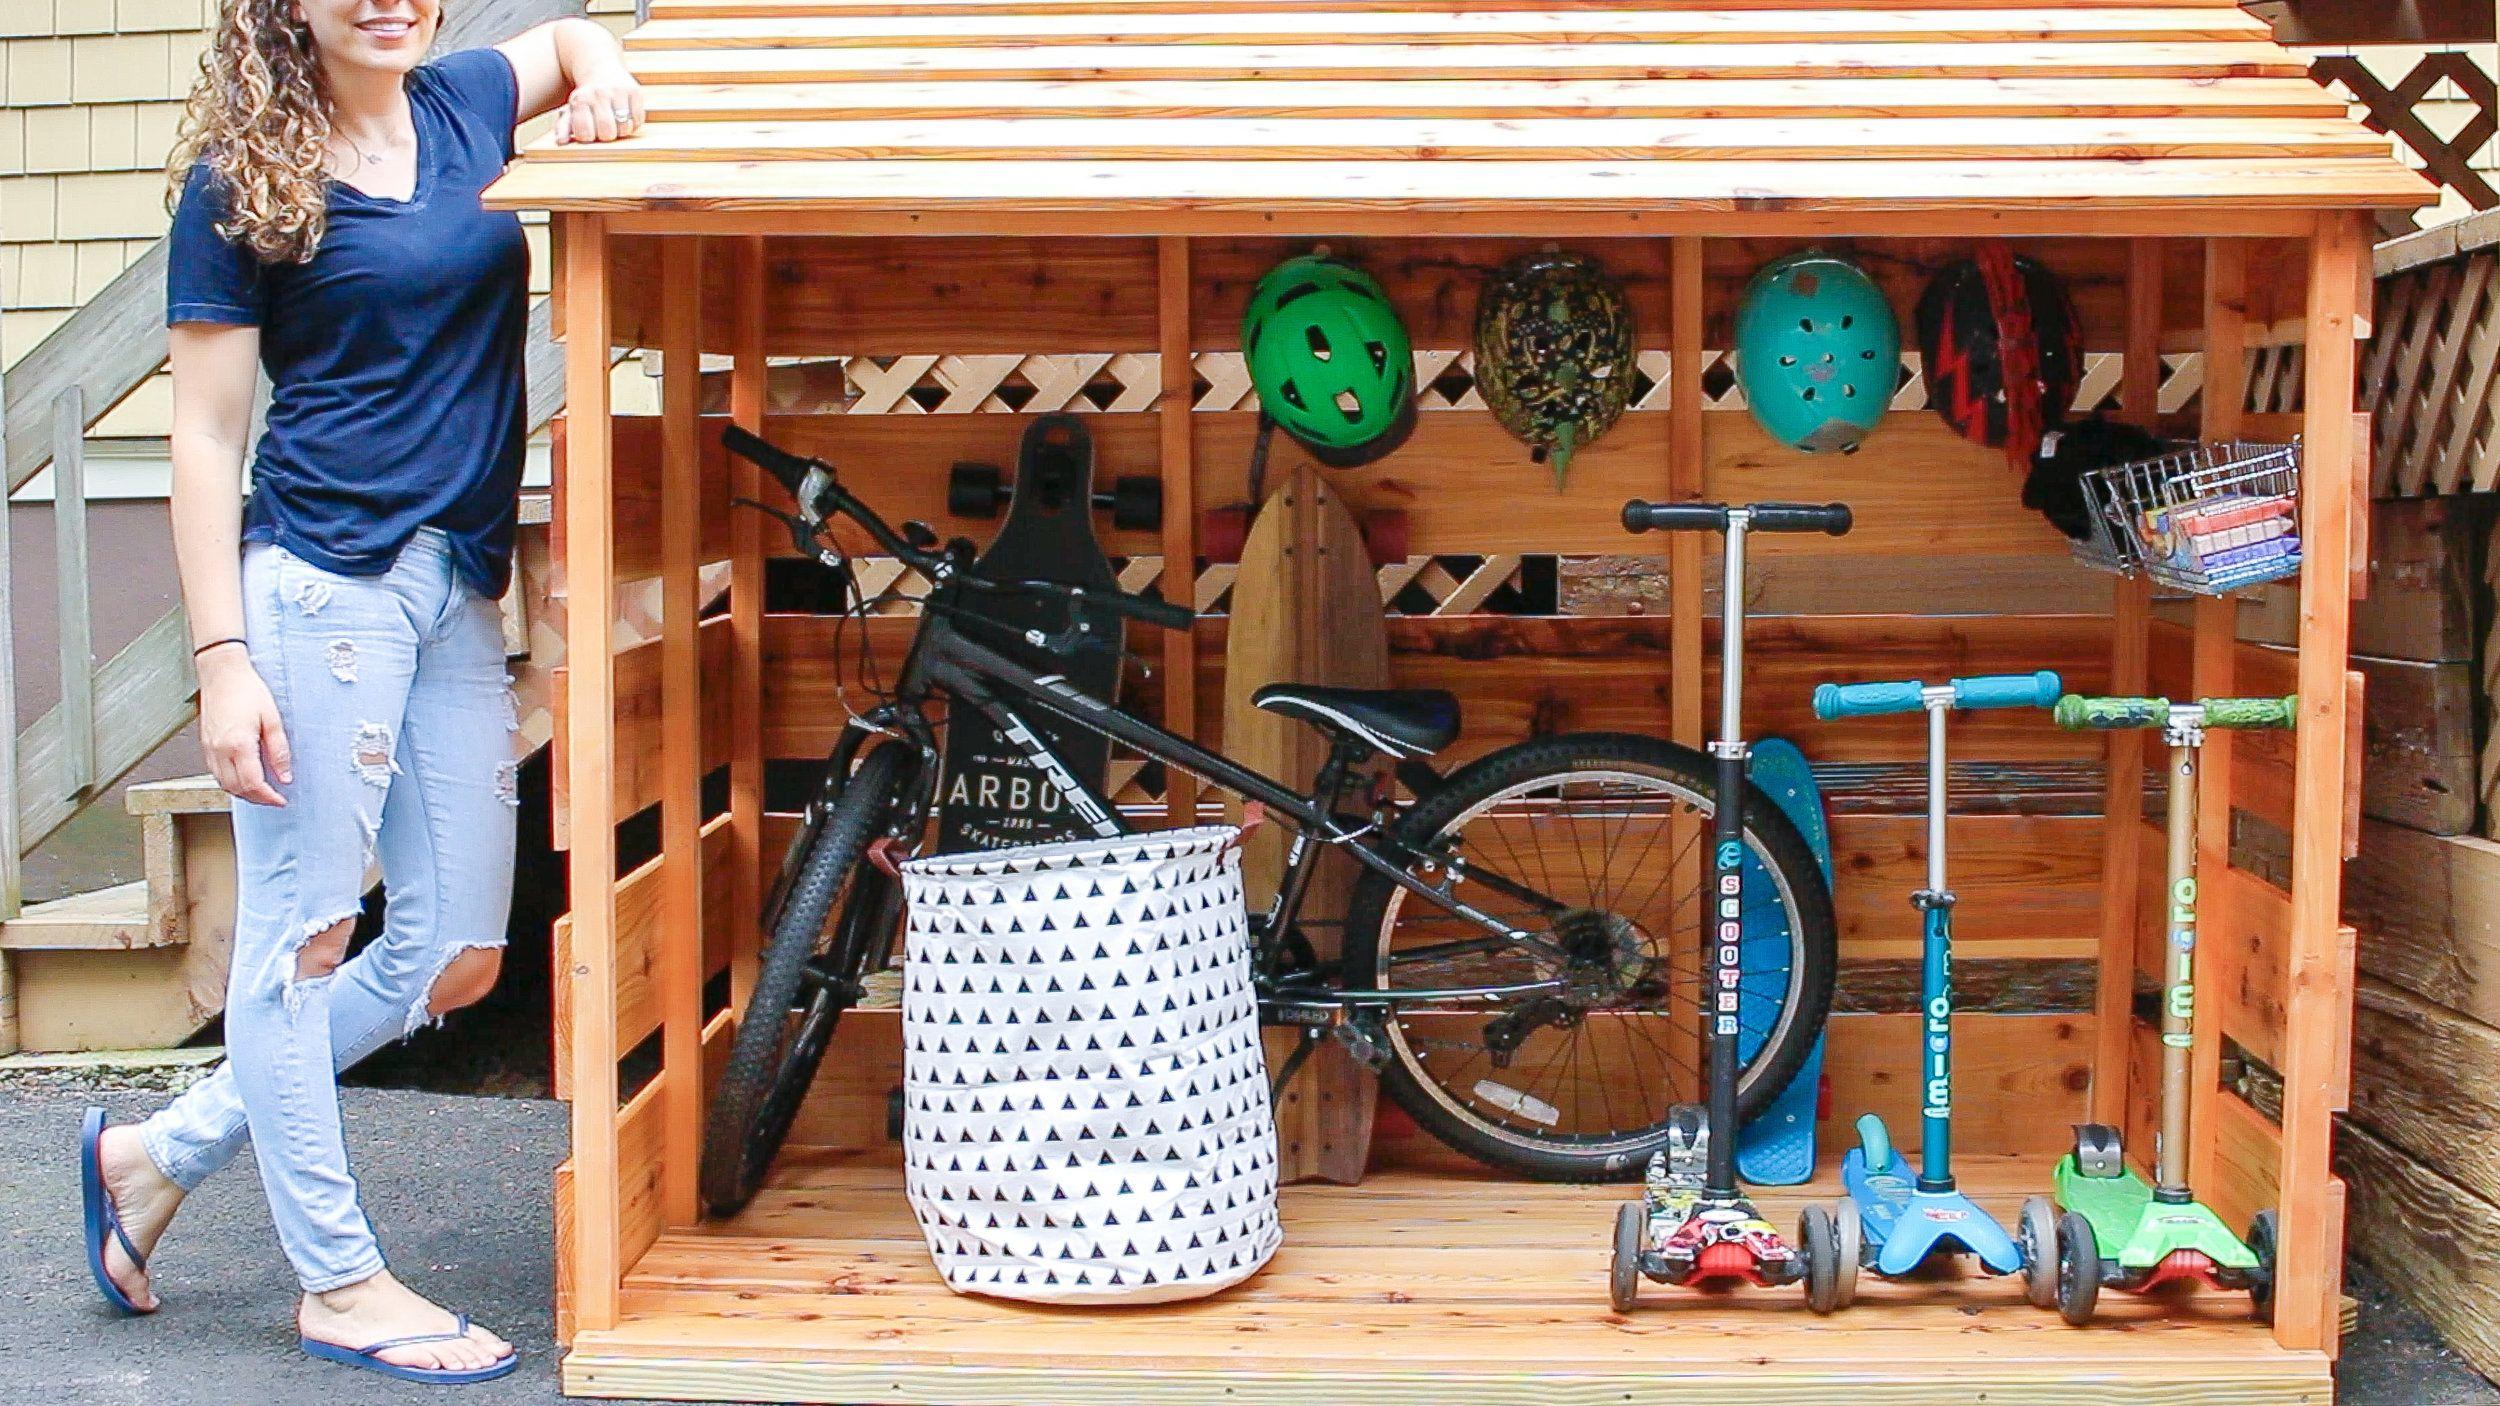 Diy Bike Storage Shed Outdoor Bike Storage Outdoor Toy Storage Bike Storage